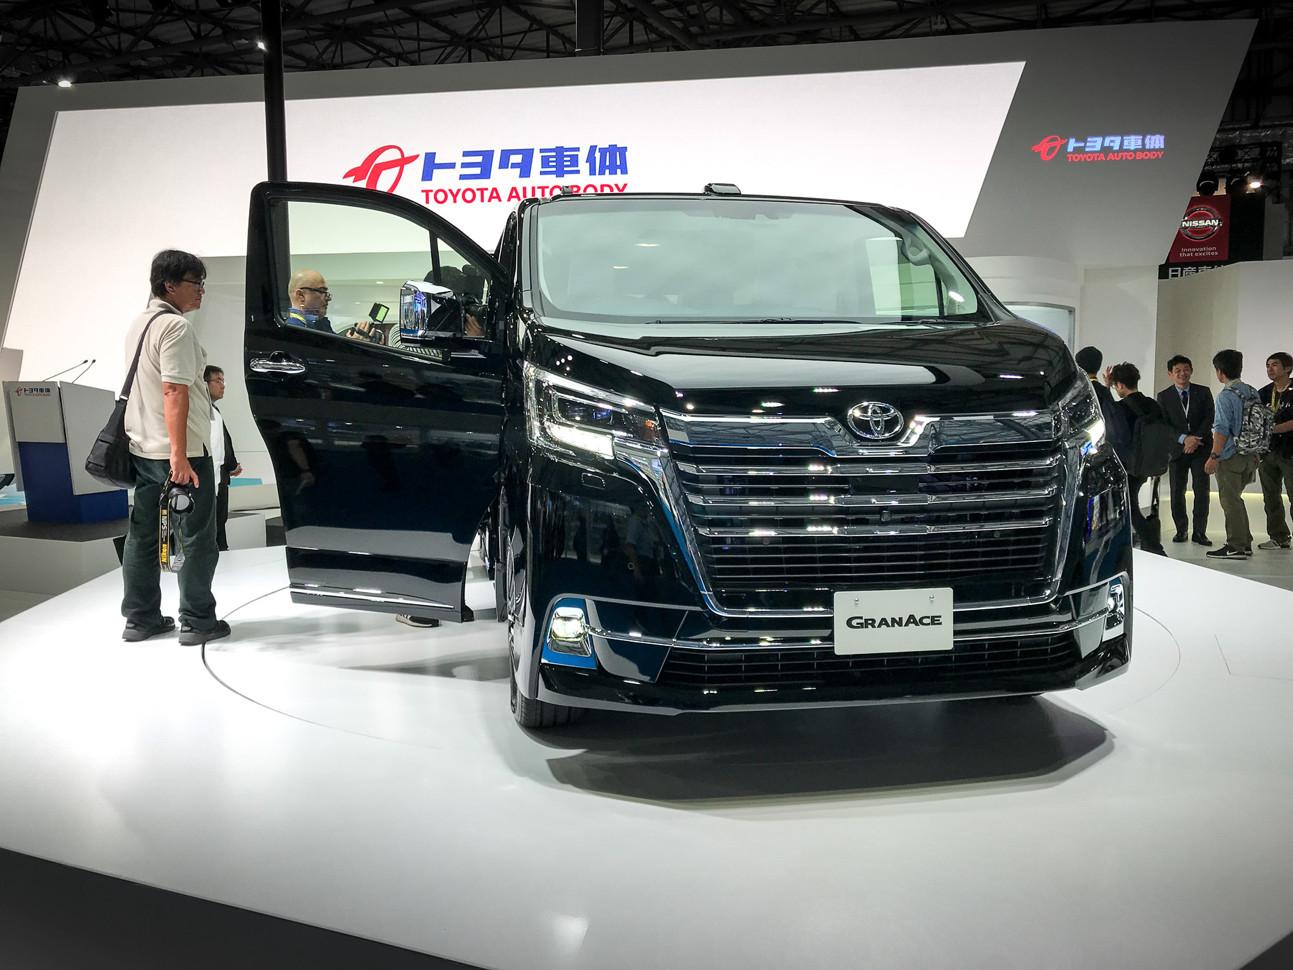 Автосалон в Токио: представлена по-настоящему богатая Toyota 1